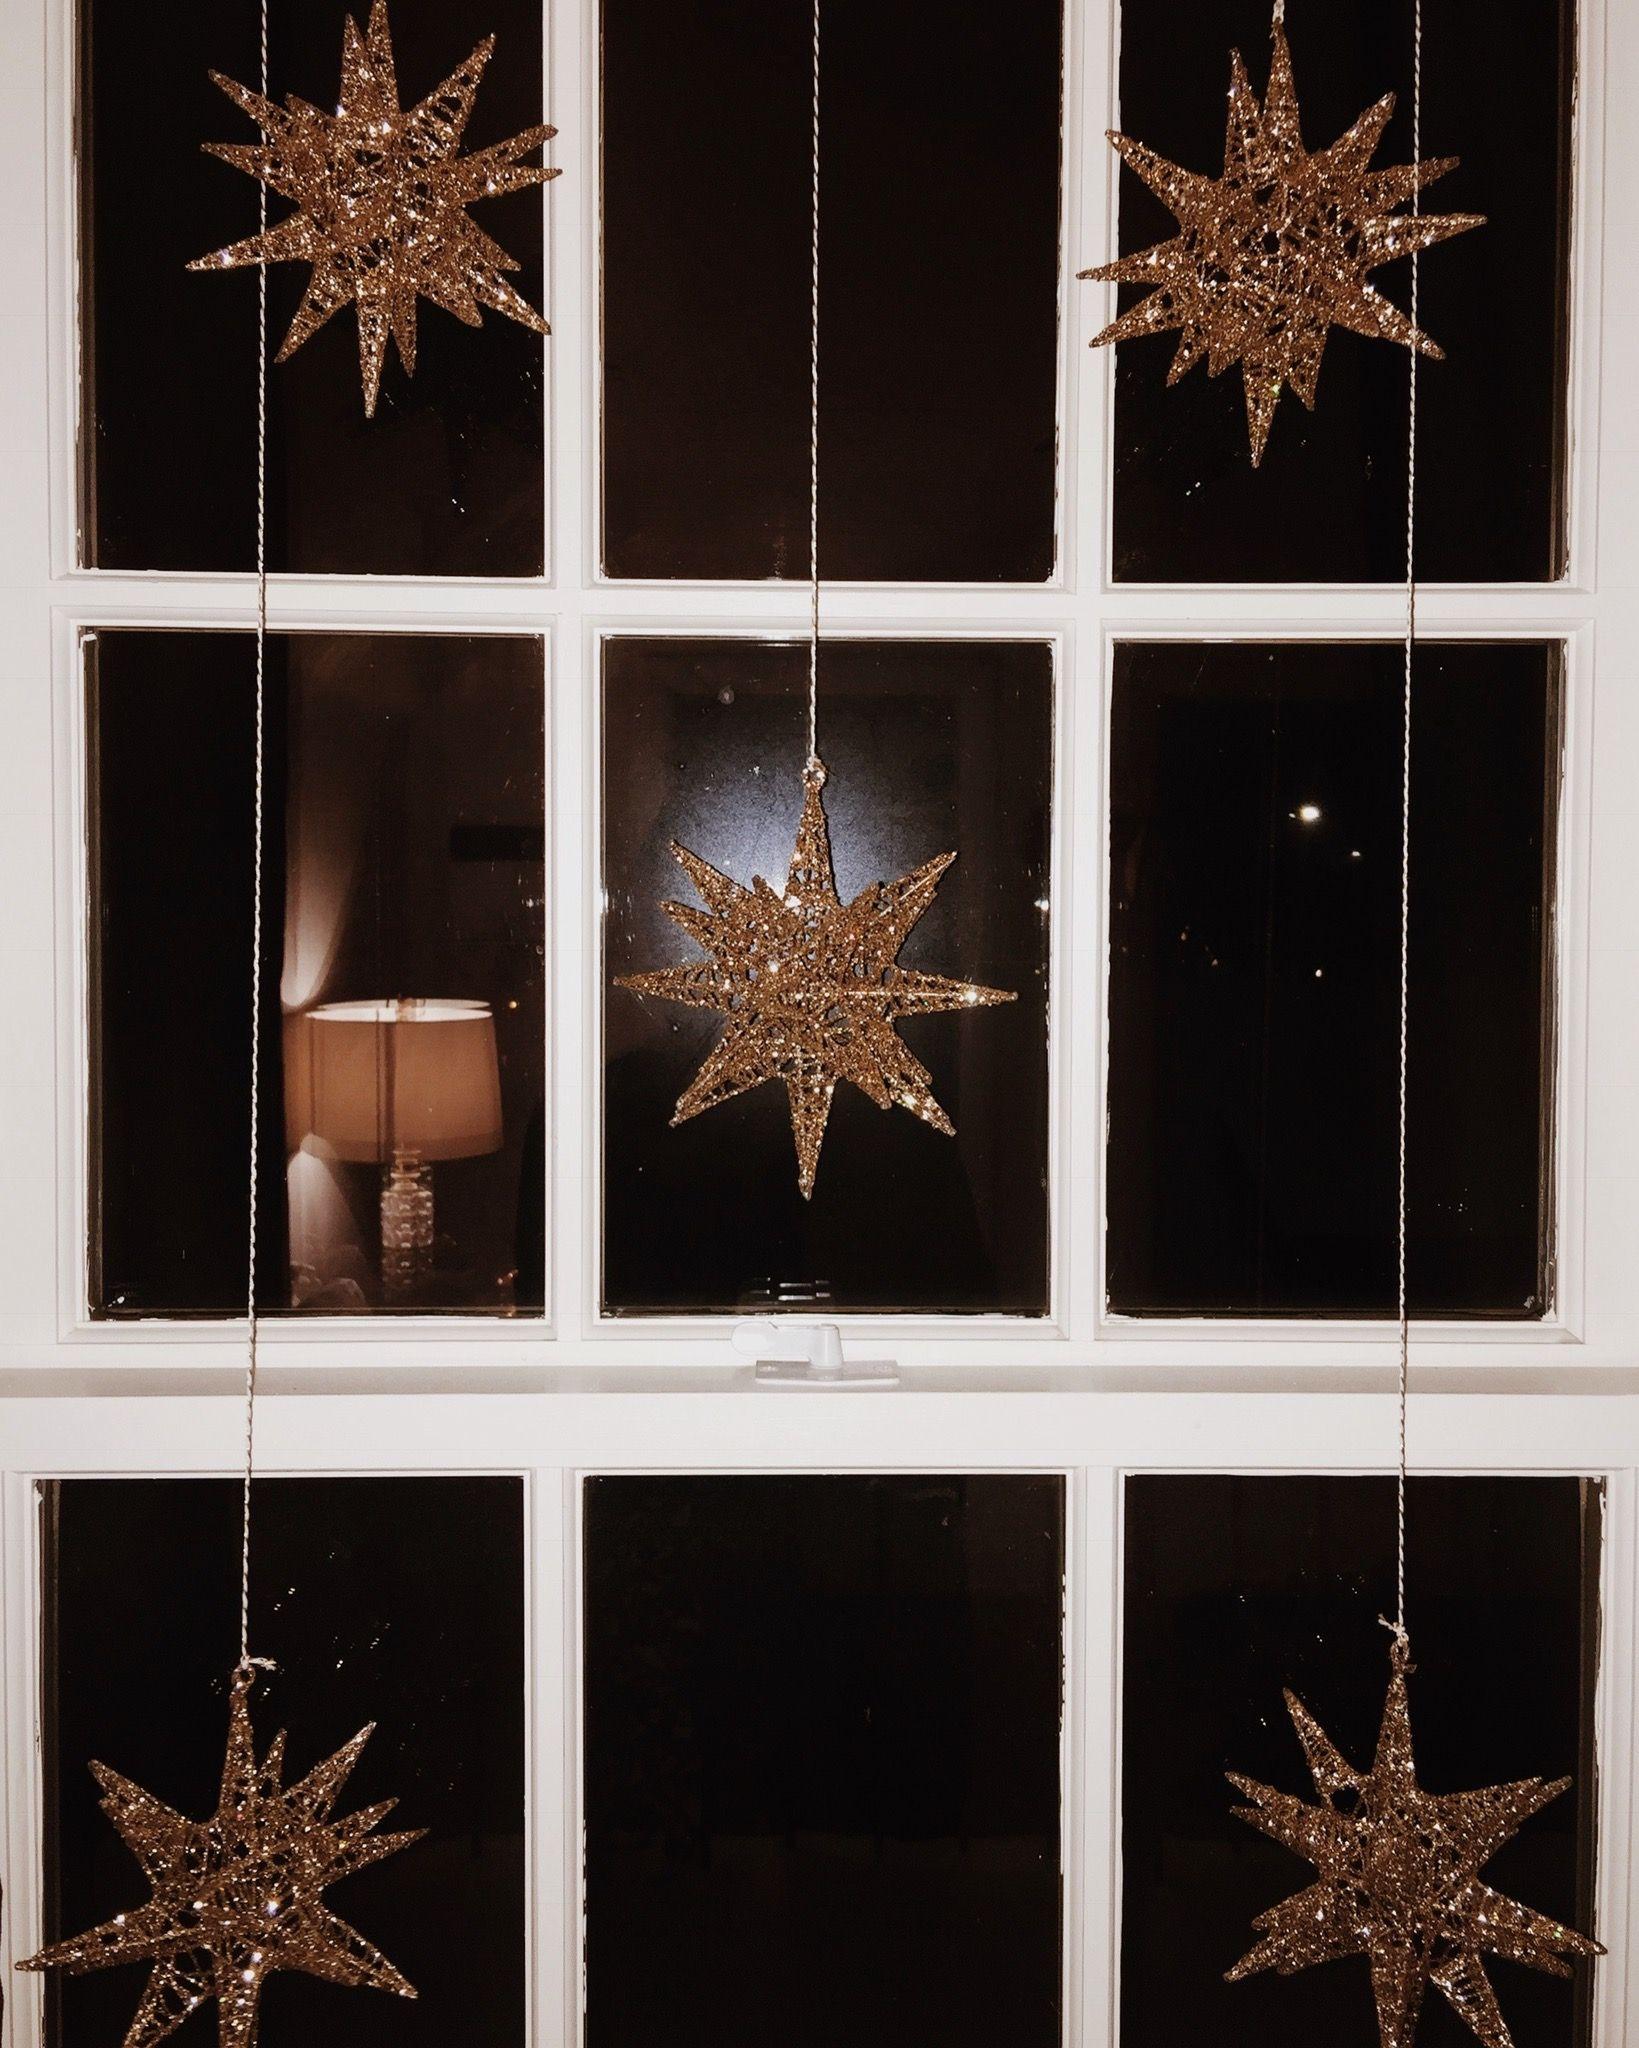 Starburst window Christmas decor